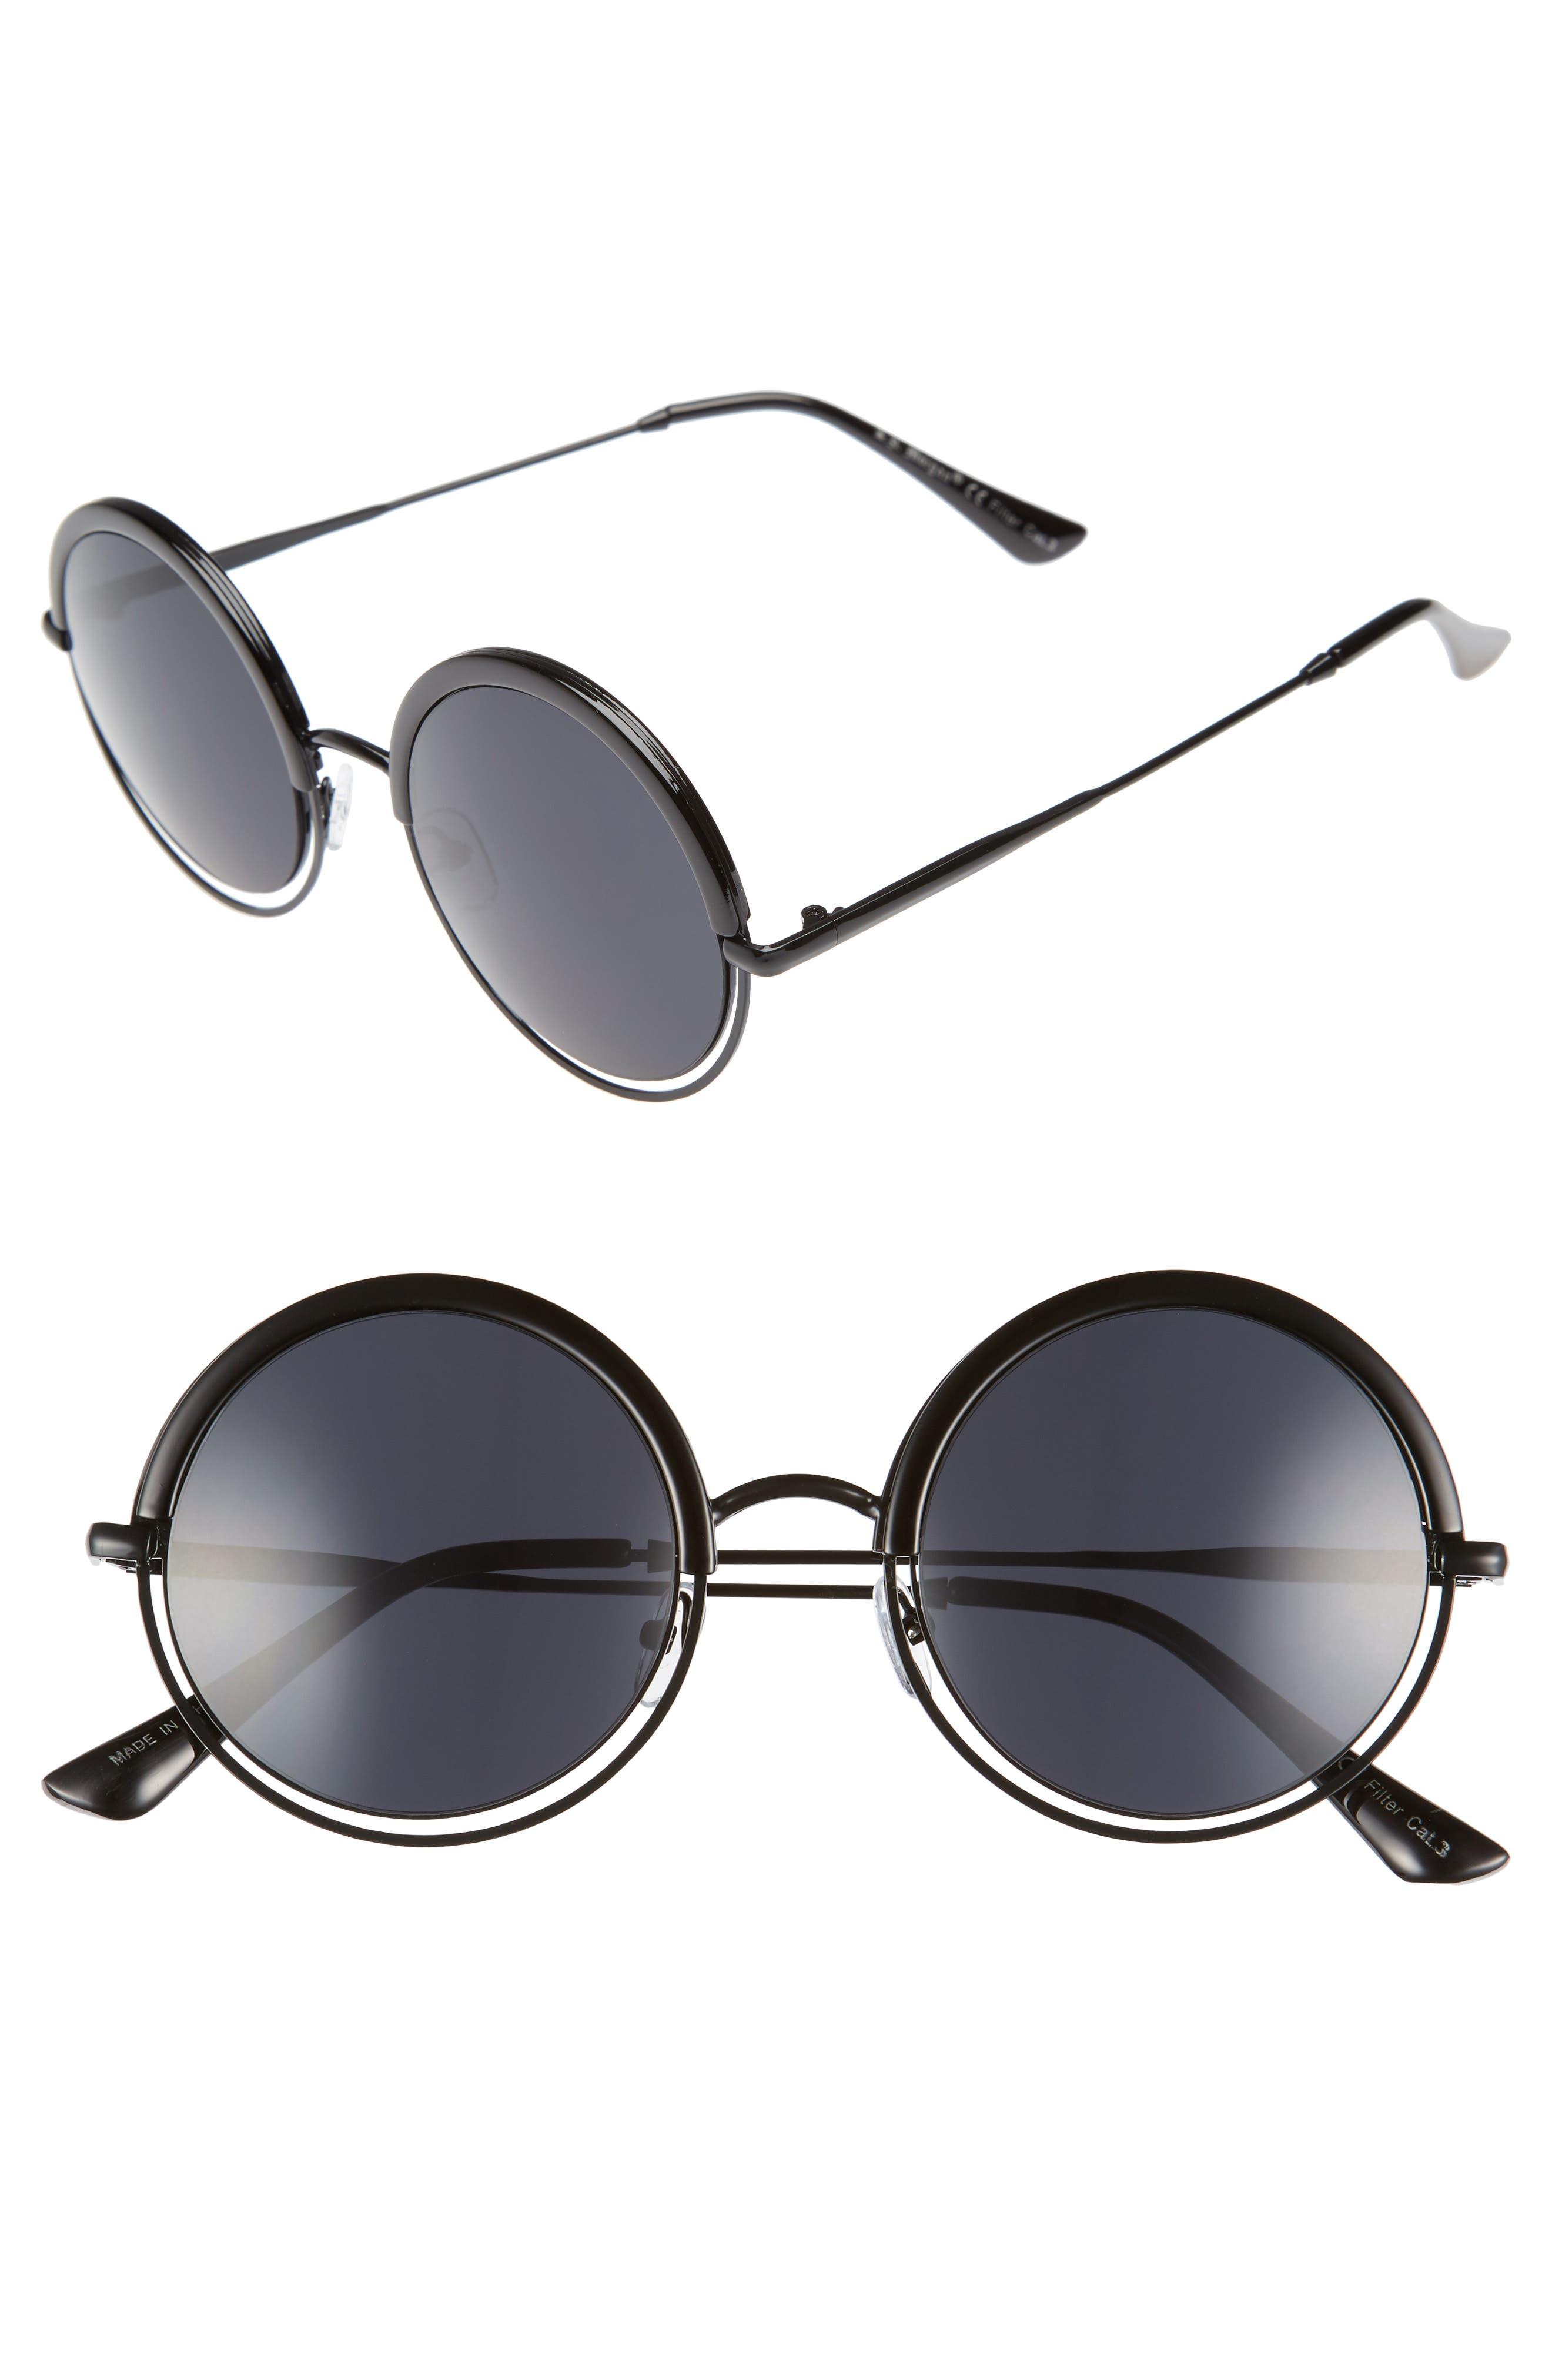 Main Image - A.J. Morgan Pancakes 52mm Gradient Lens Round Sunglasses